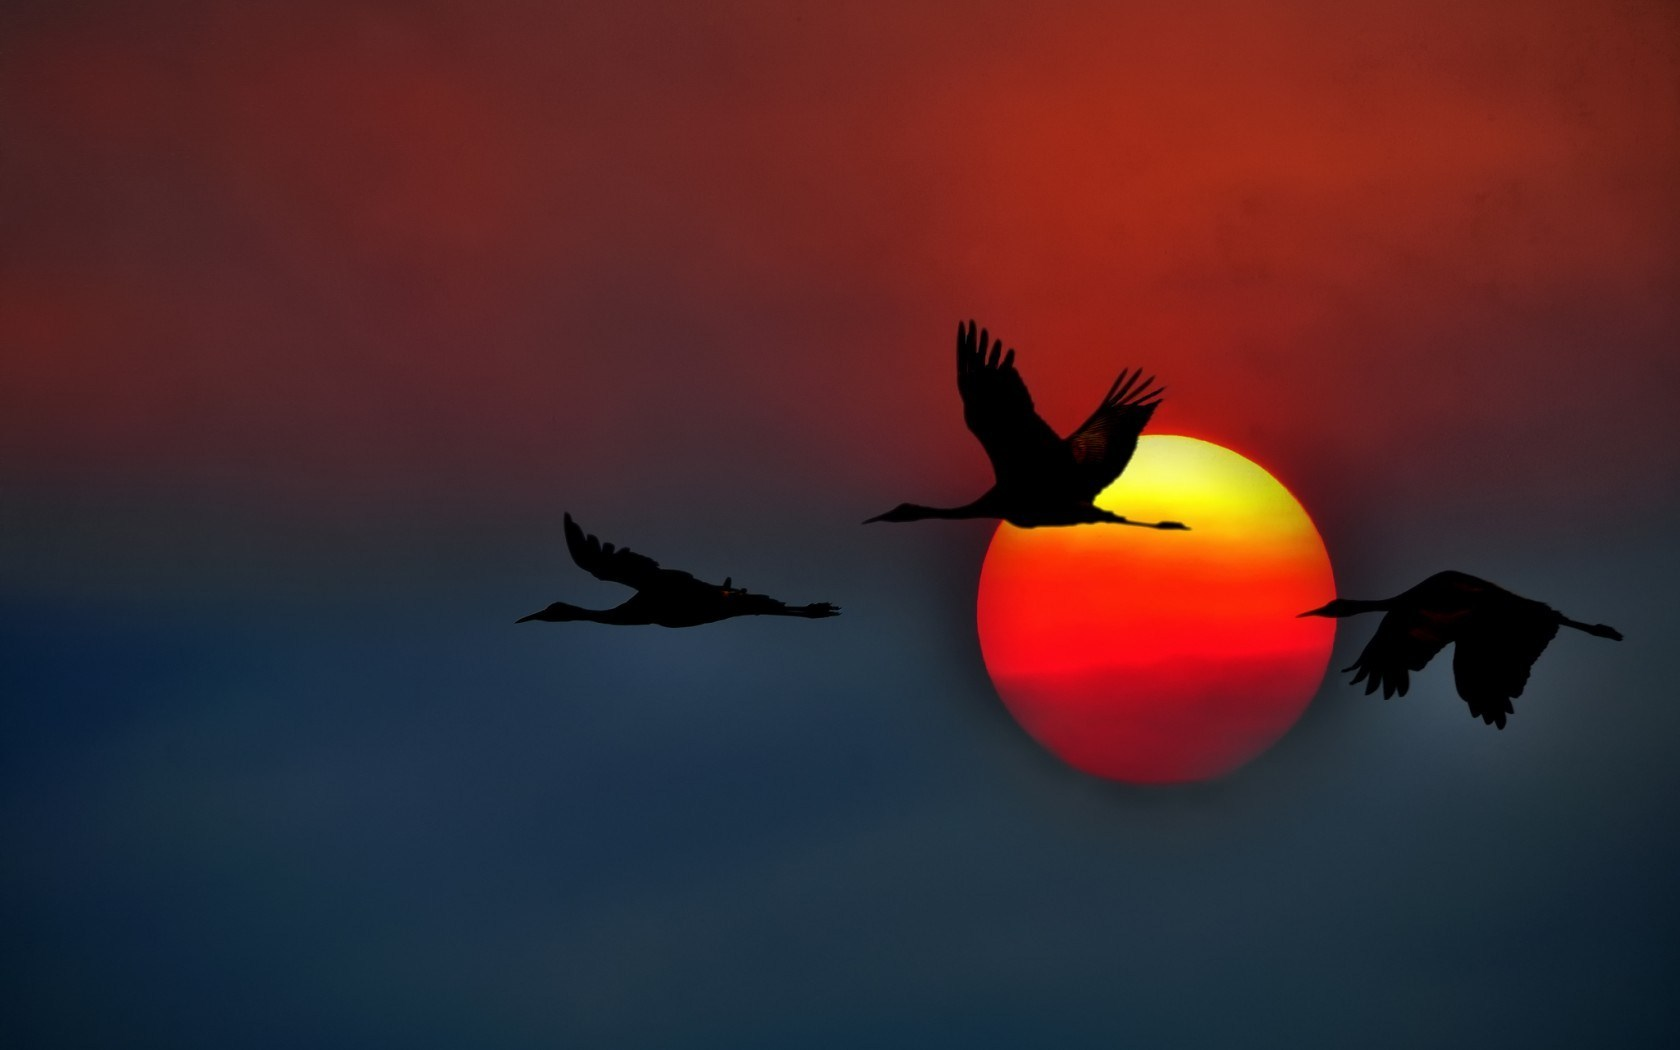 Birds Sandhill Cranes Flying California USA Sunset Sky Photo